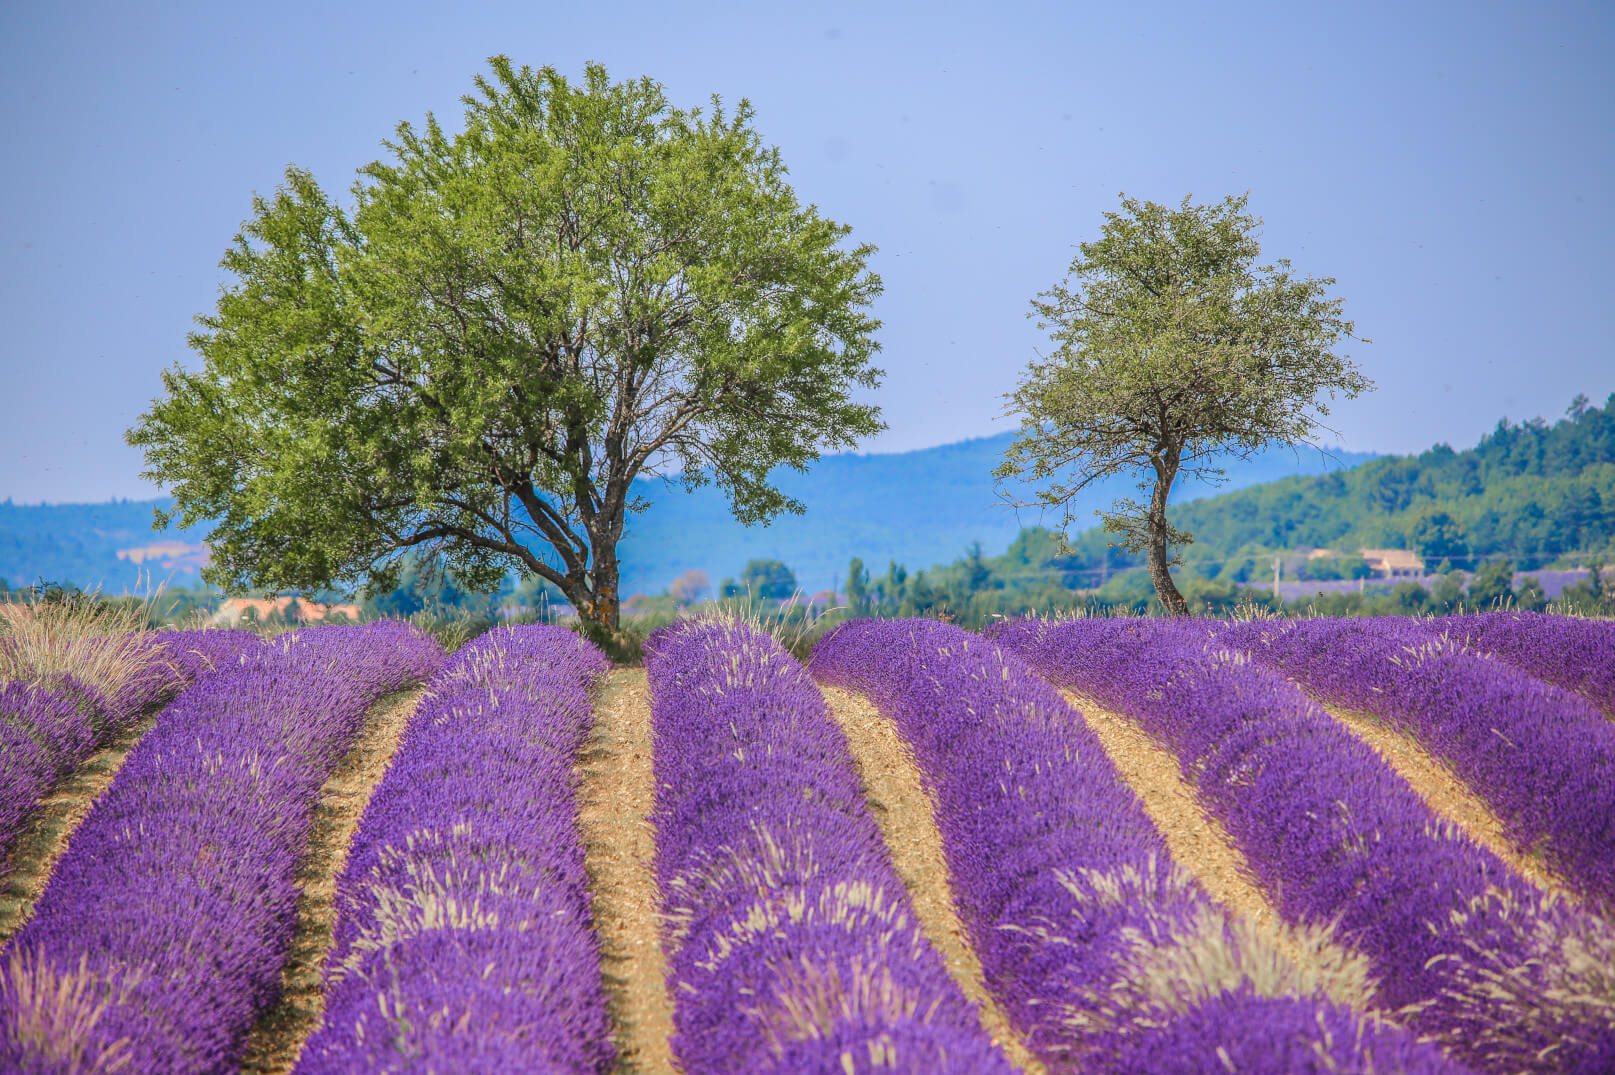 Wochenende im Land des Lavendels